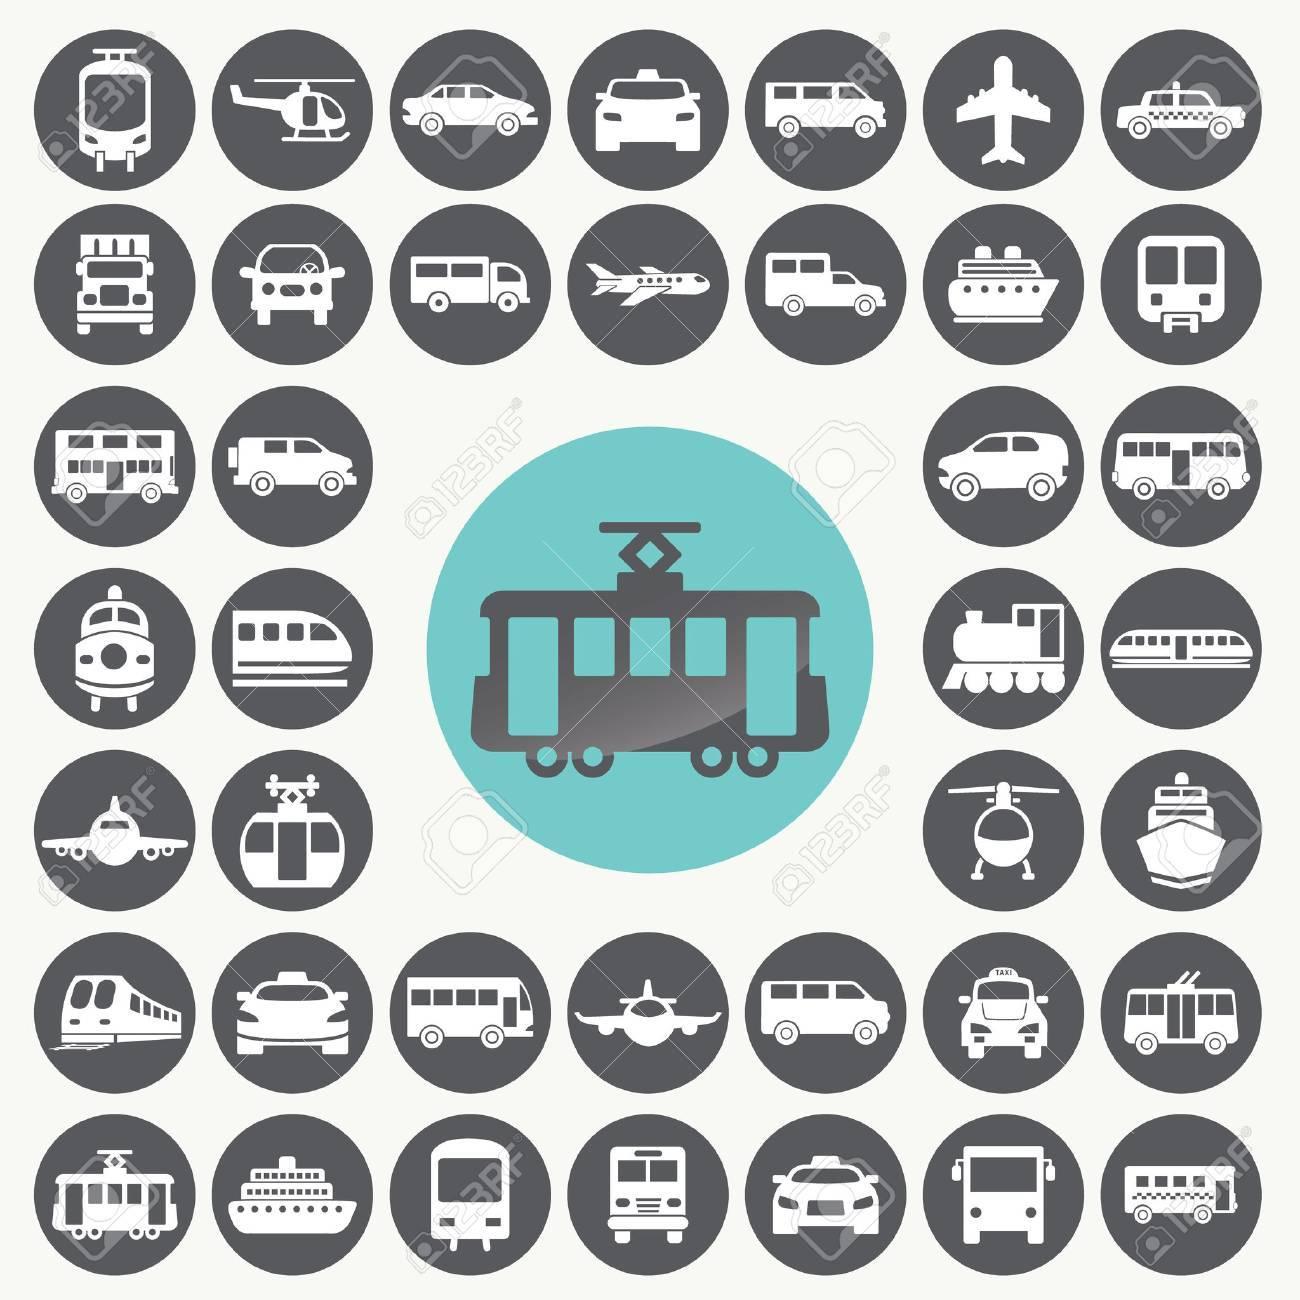 Public transportation icons set. - 33069411